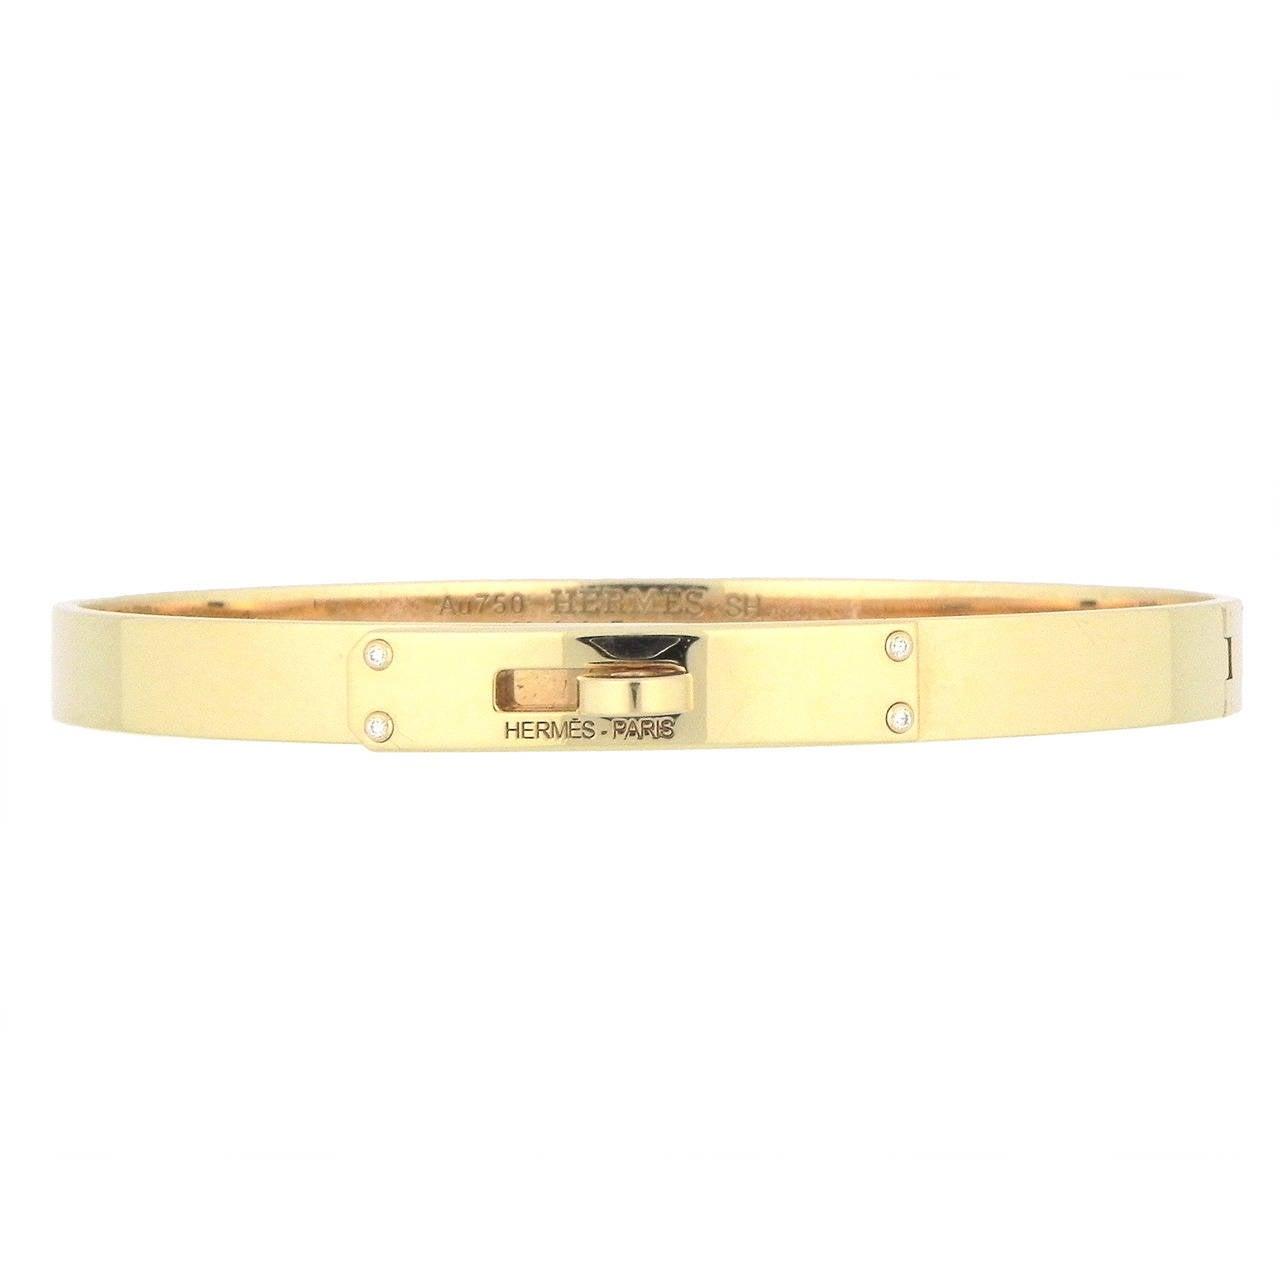 replica hermes birkin - Hermes Diamond Gold Kelly Bracelet with Box at 1stdibs